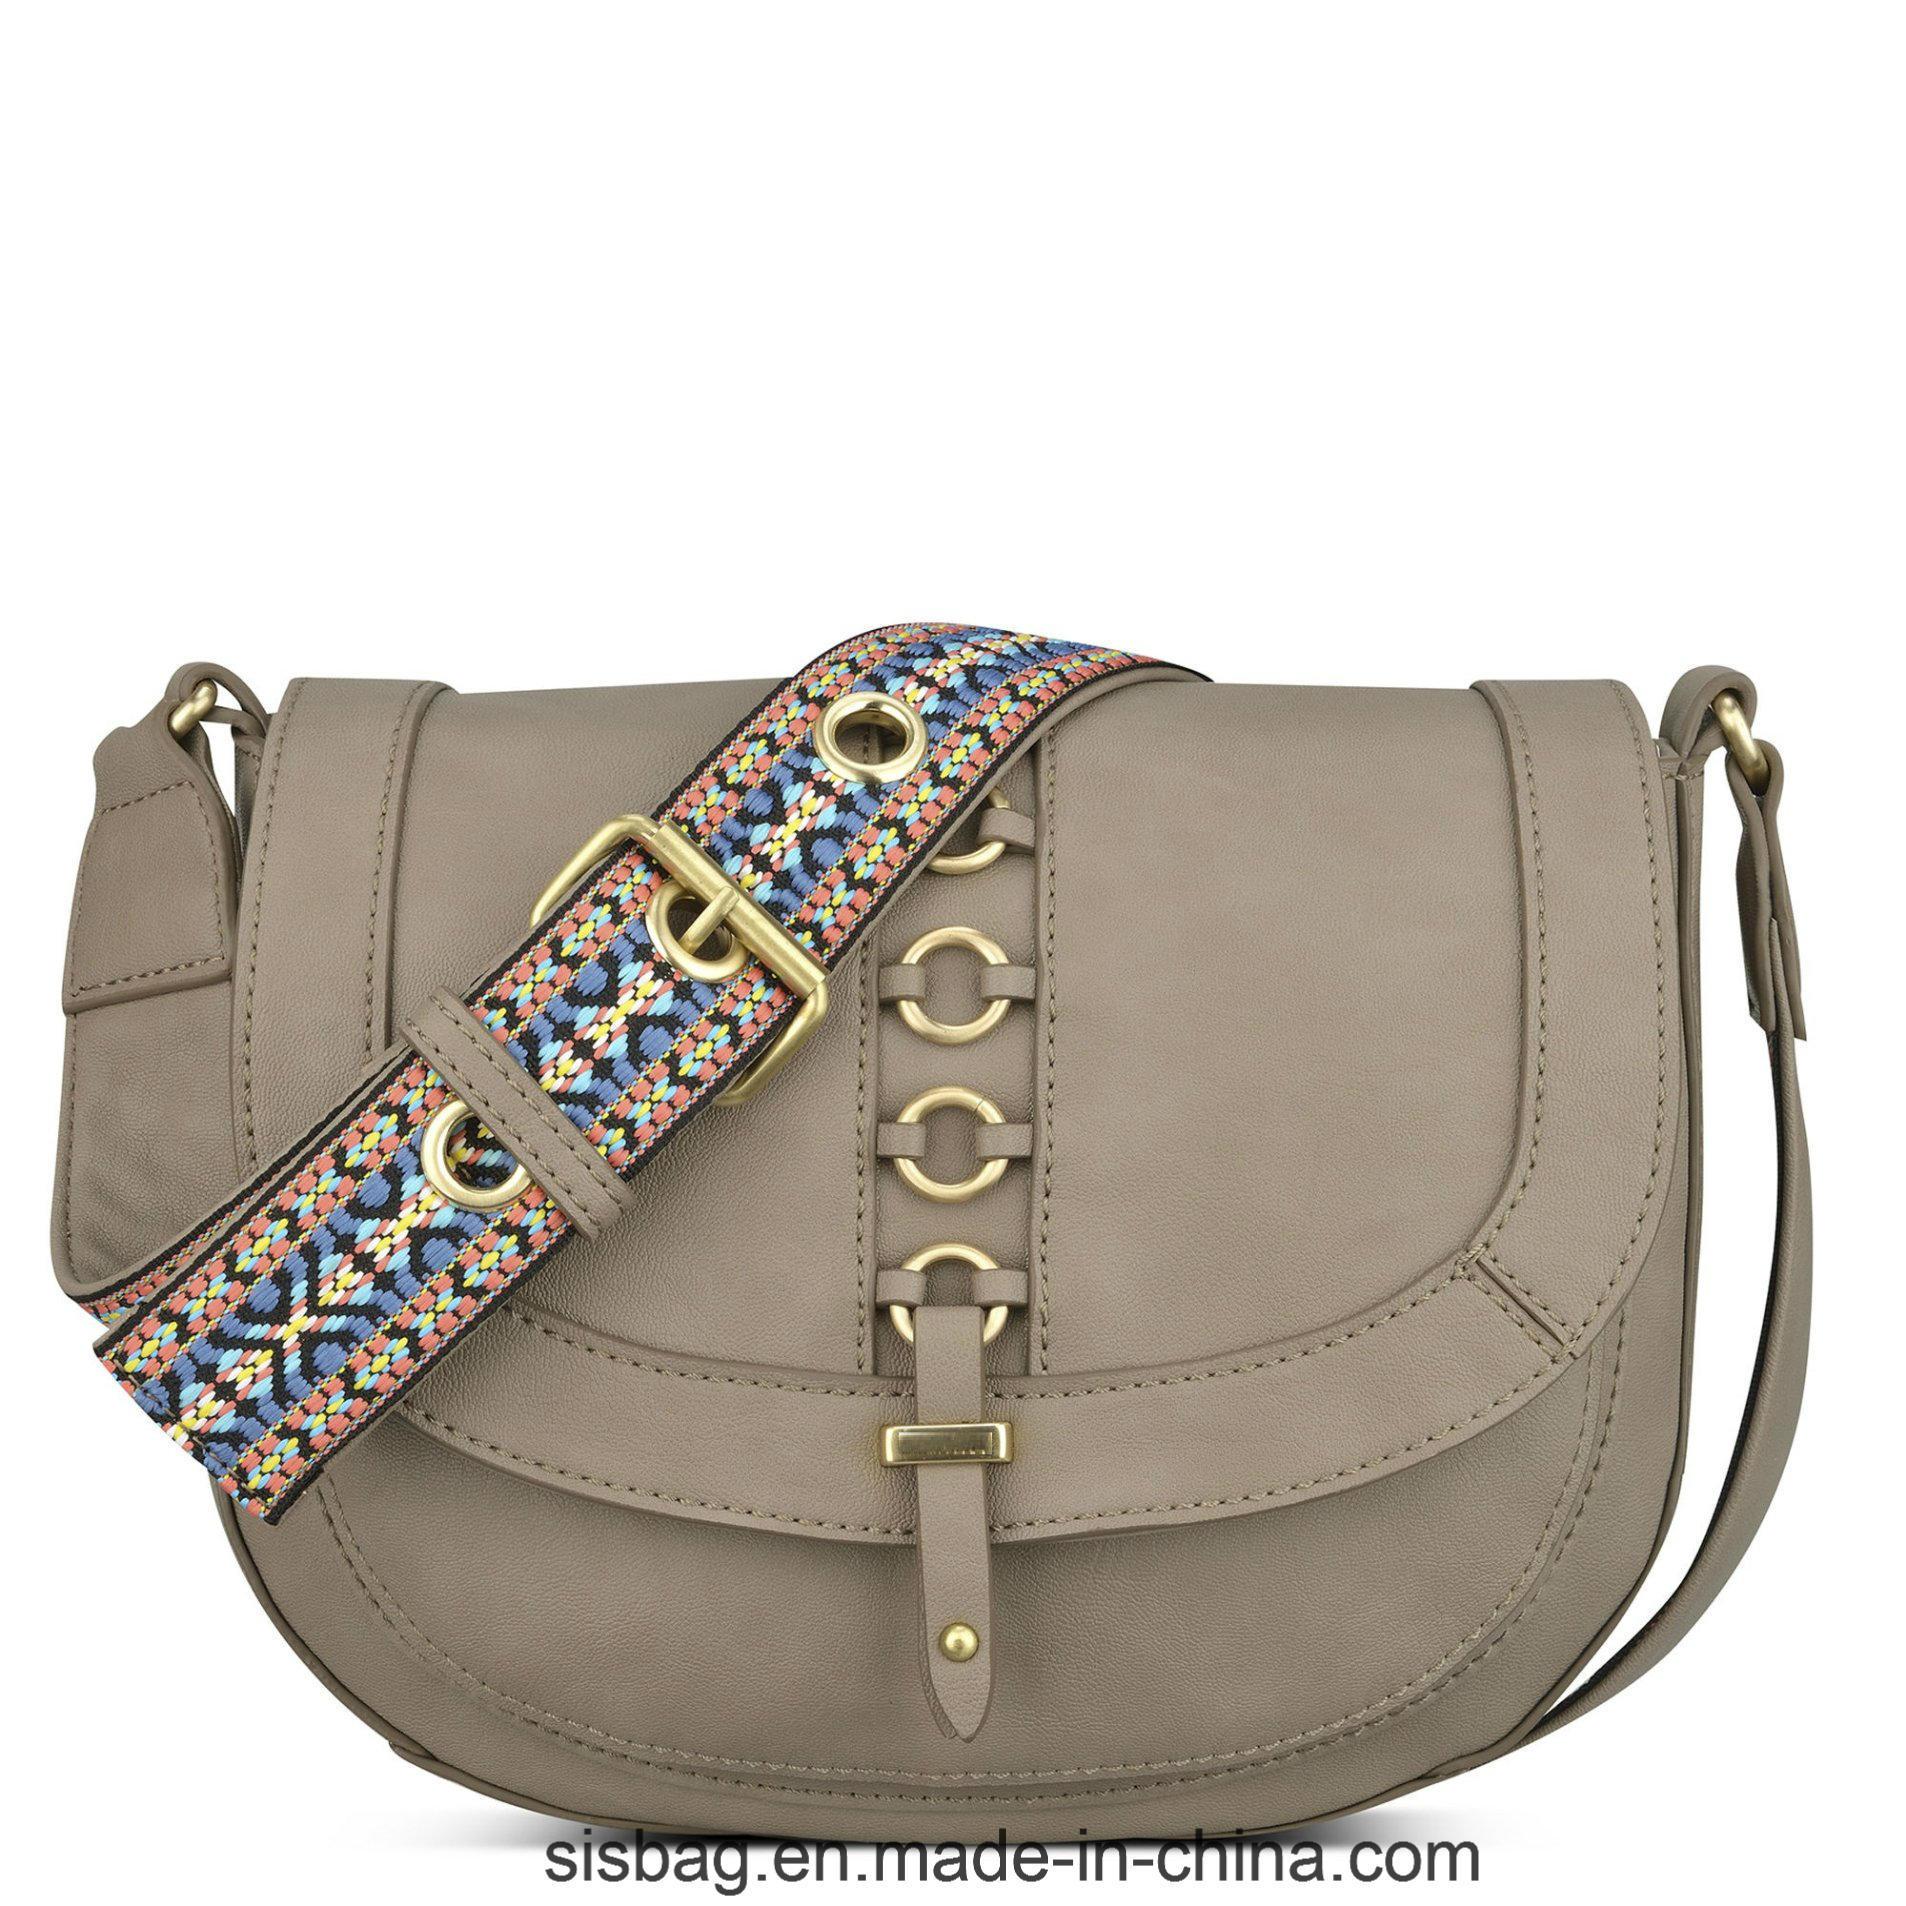 Colorful Straps Saddle Bag Sticthing Cross Body Bag